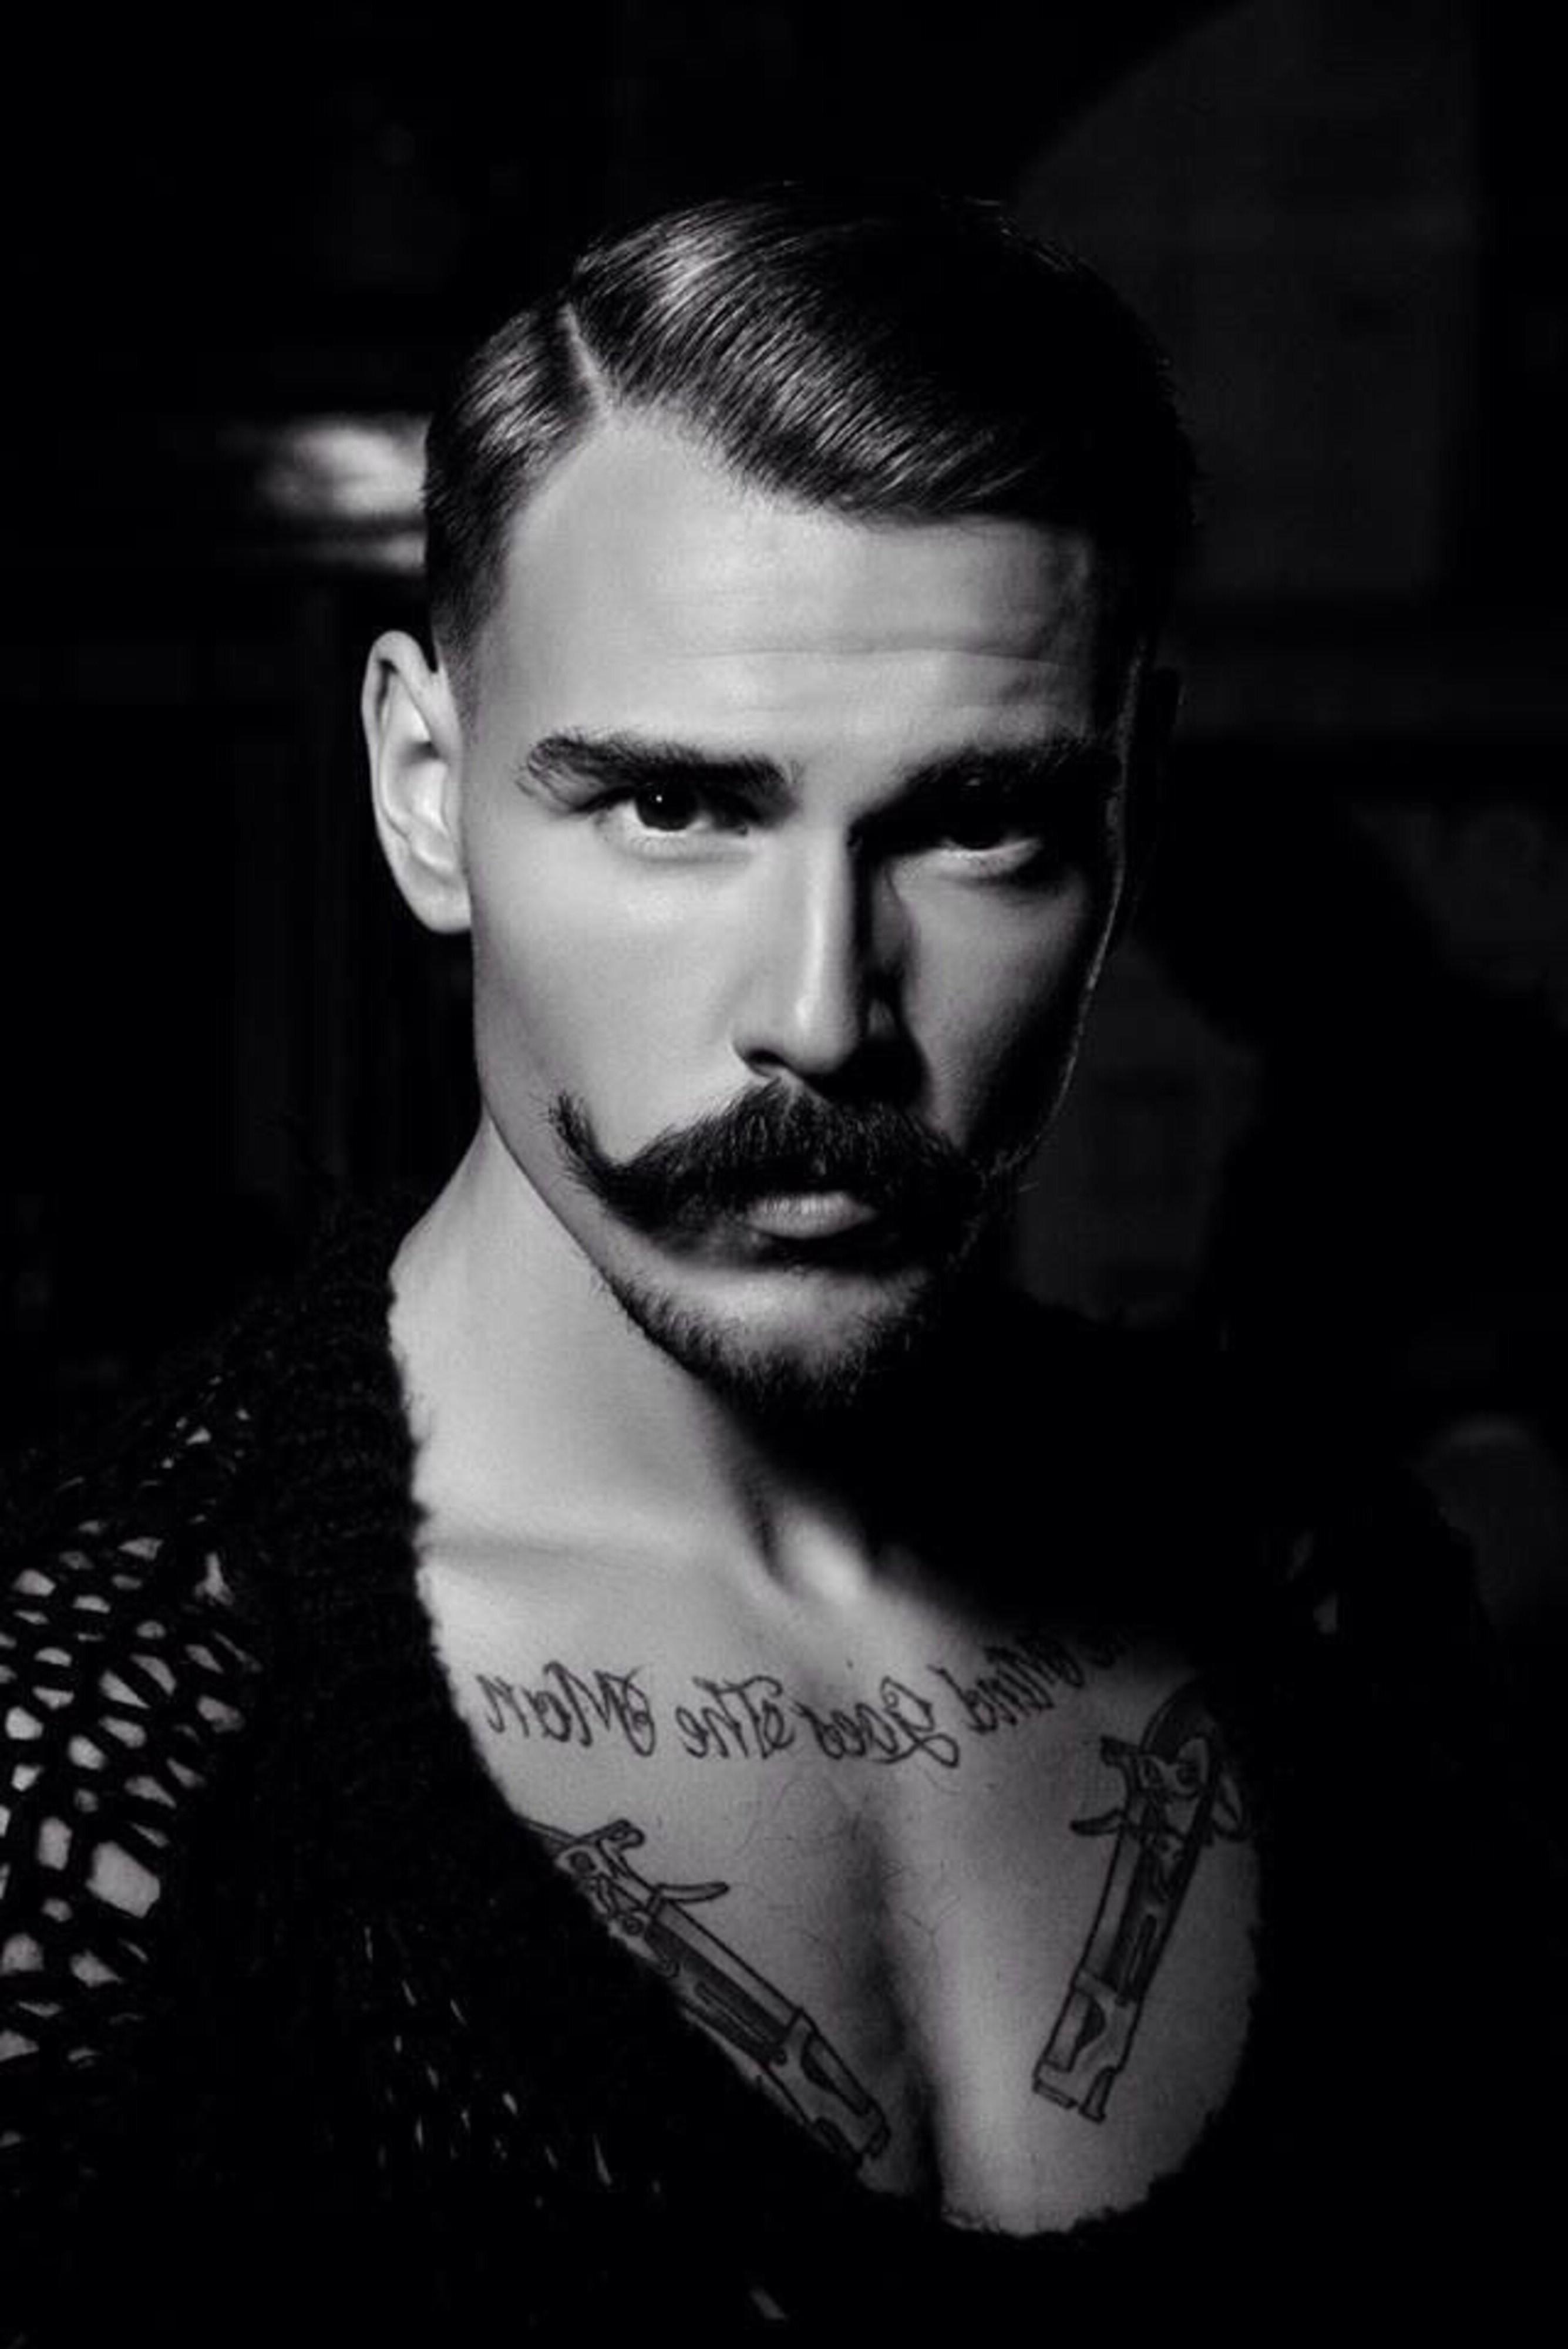 Freddie Mercury's style with handlebar mustache.